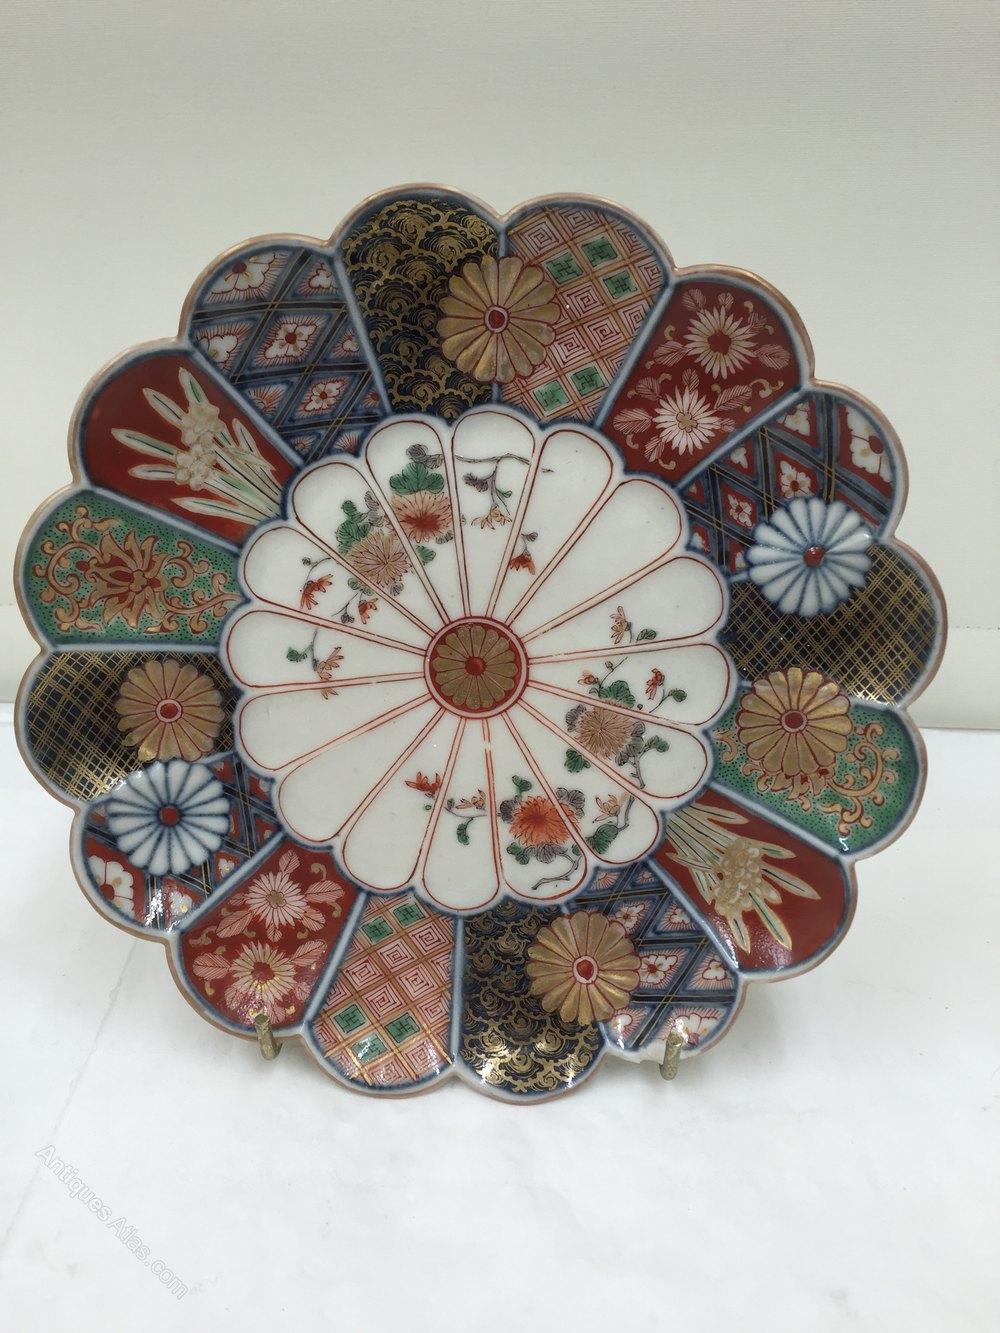 dating imari porcelain Results 1 - 48 of 210  early arita, ko-imari, nabeshima, kakiemon porcelain  marked on the original  wooden box, dating to the japanese year kansei 5 of the.